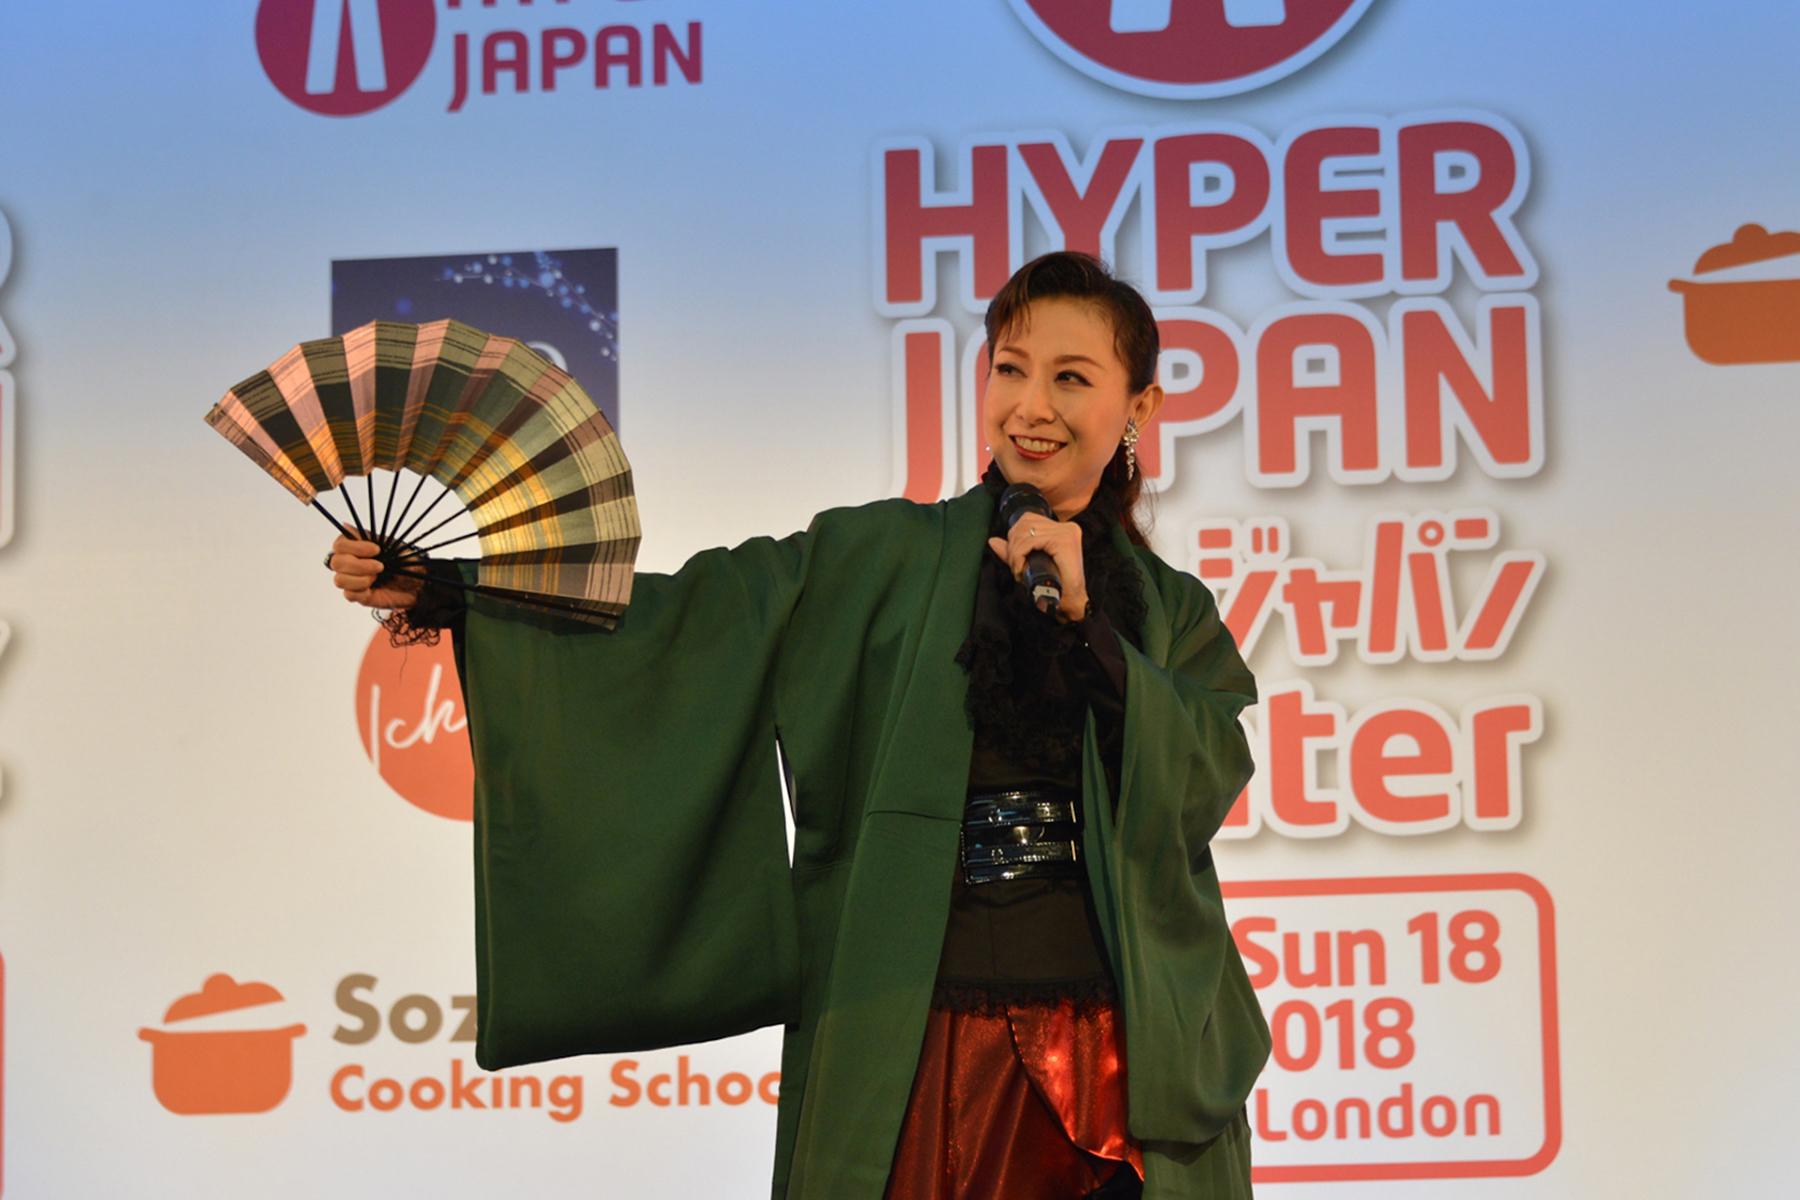 20181127 [HYPER JAPAN] 『HYPER JAPAN 2018 WINTER』元宝塚歌劇団花組・真丘奈央Stage Report!